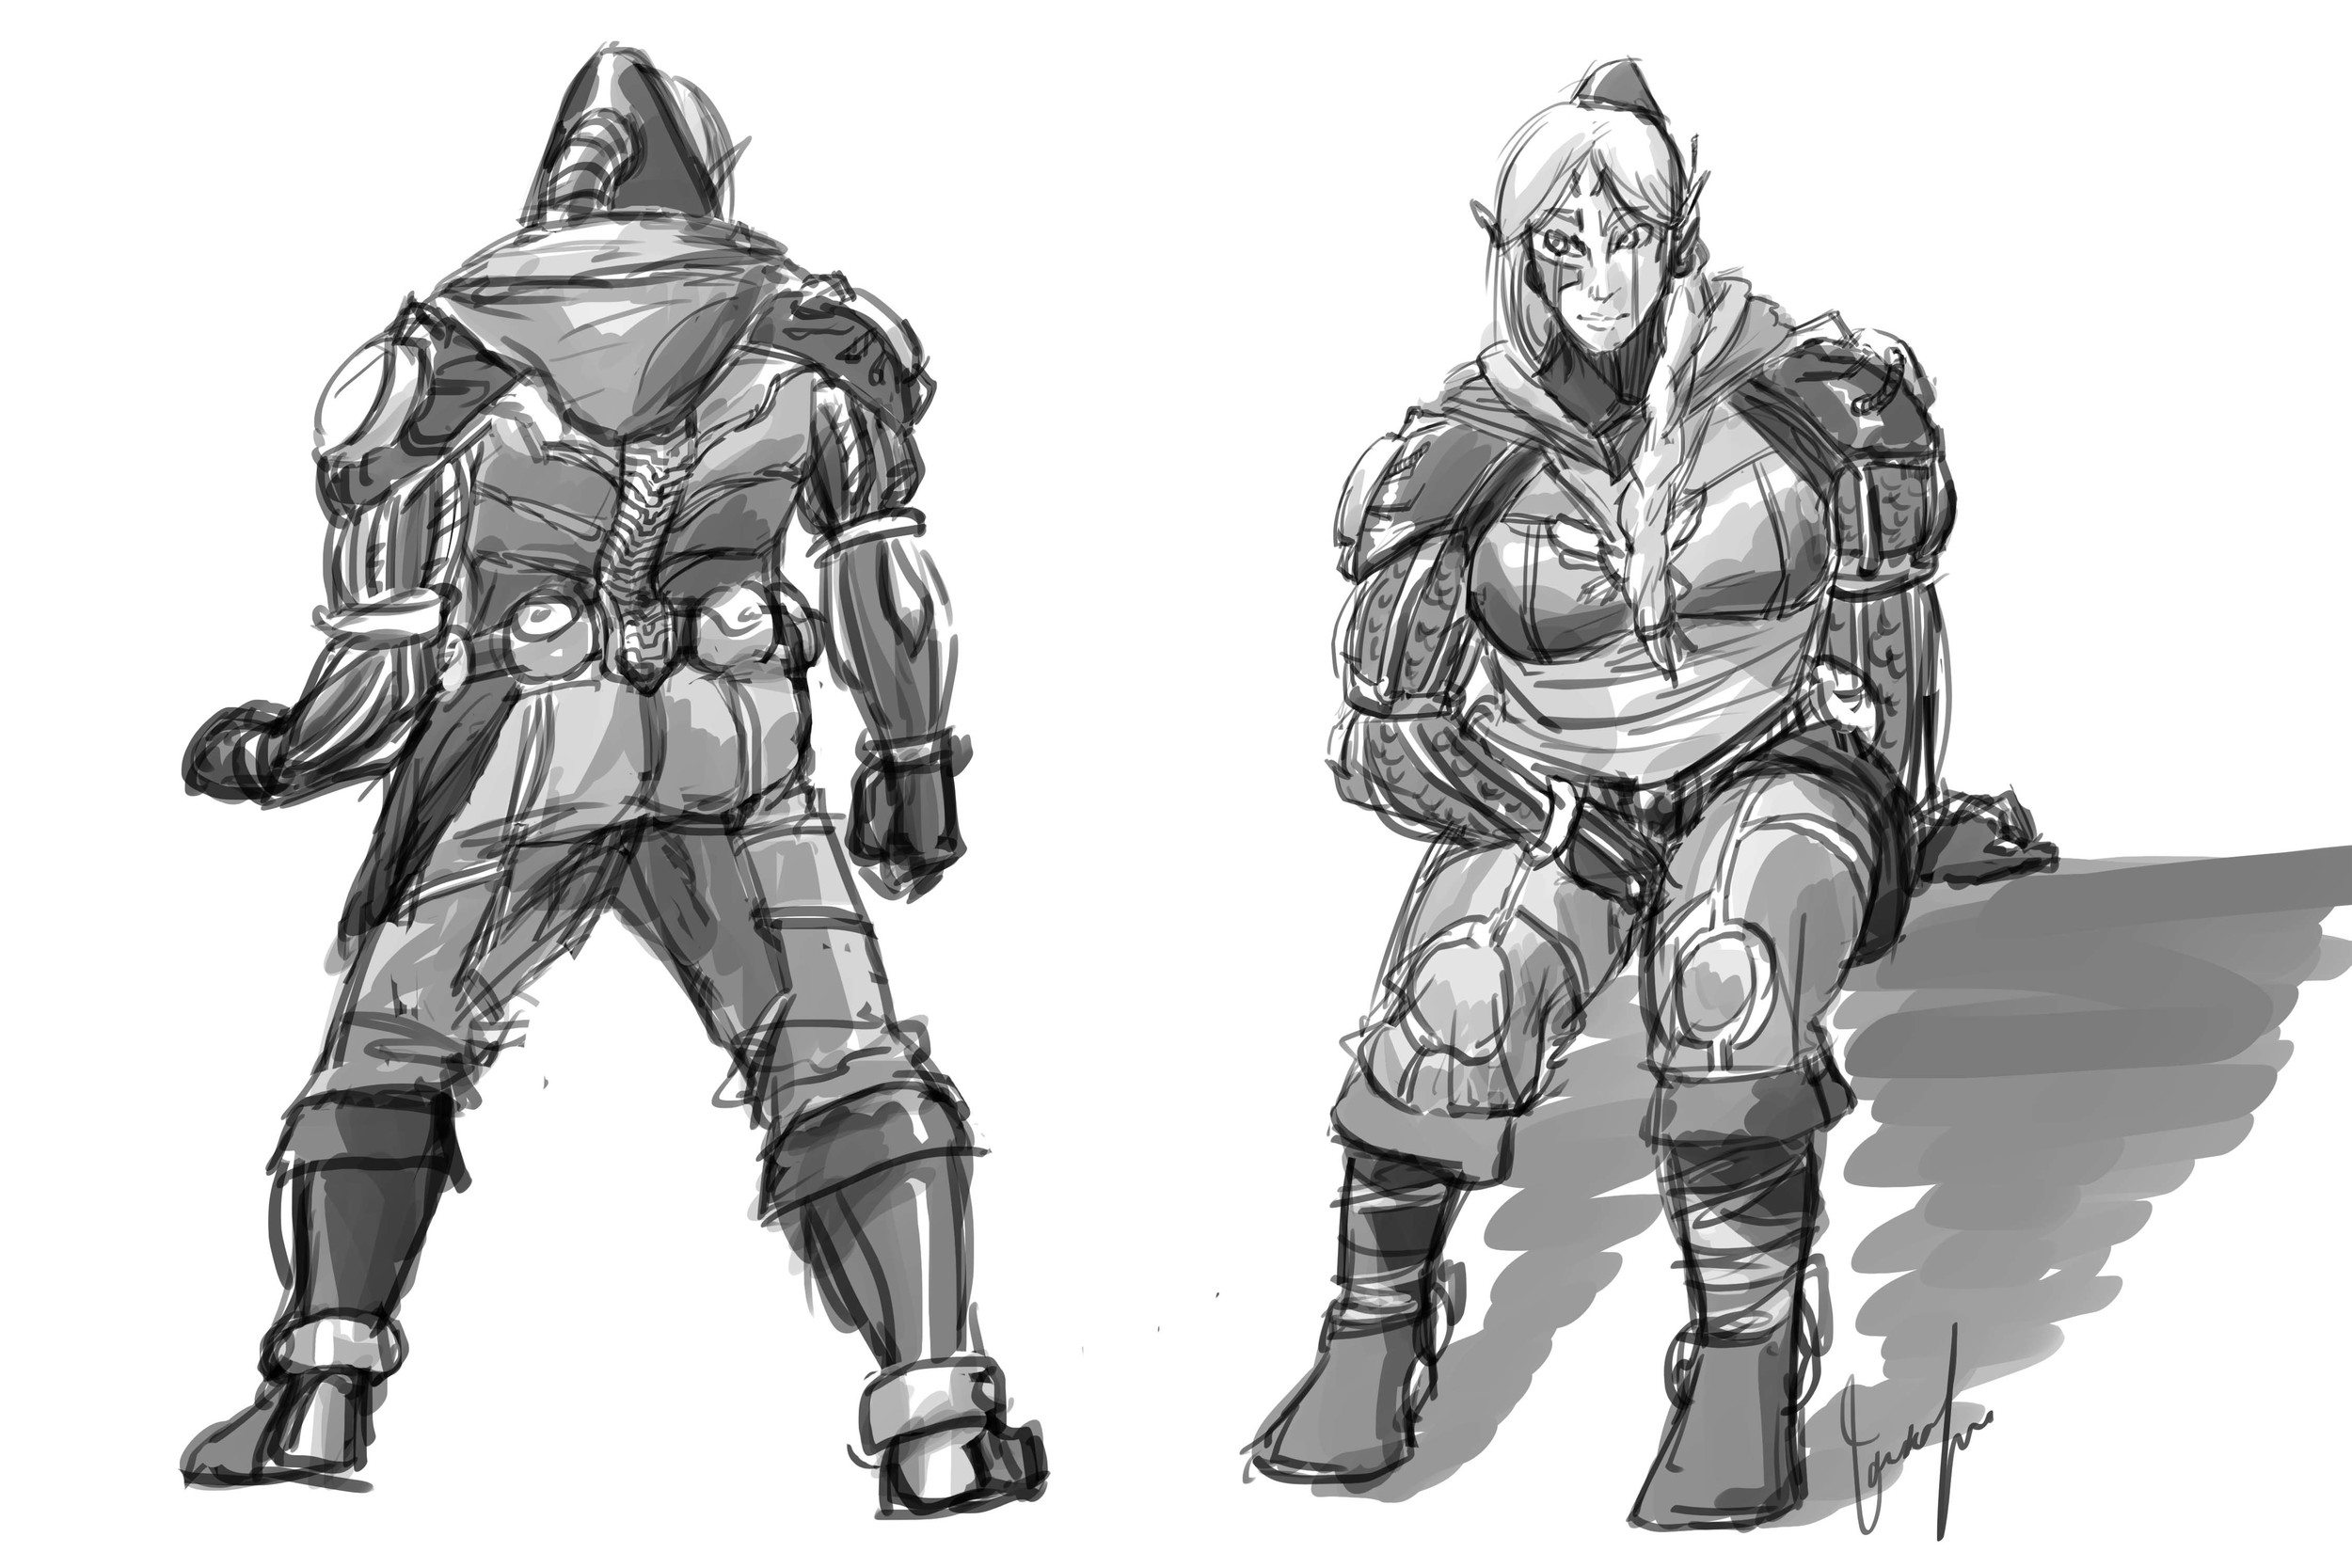 character sheet - astryd tank2.jpg